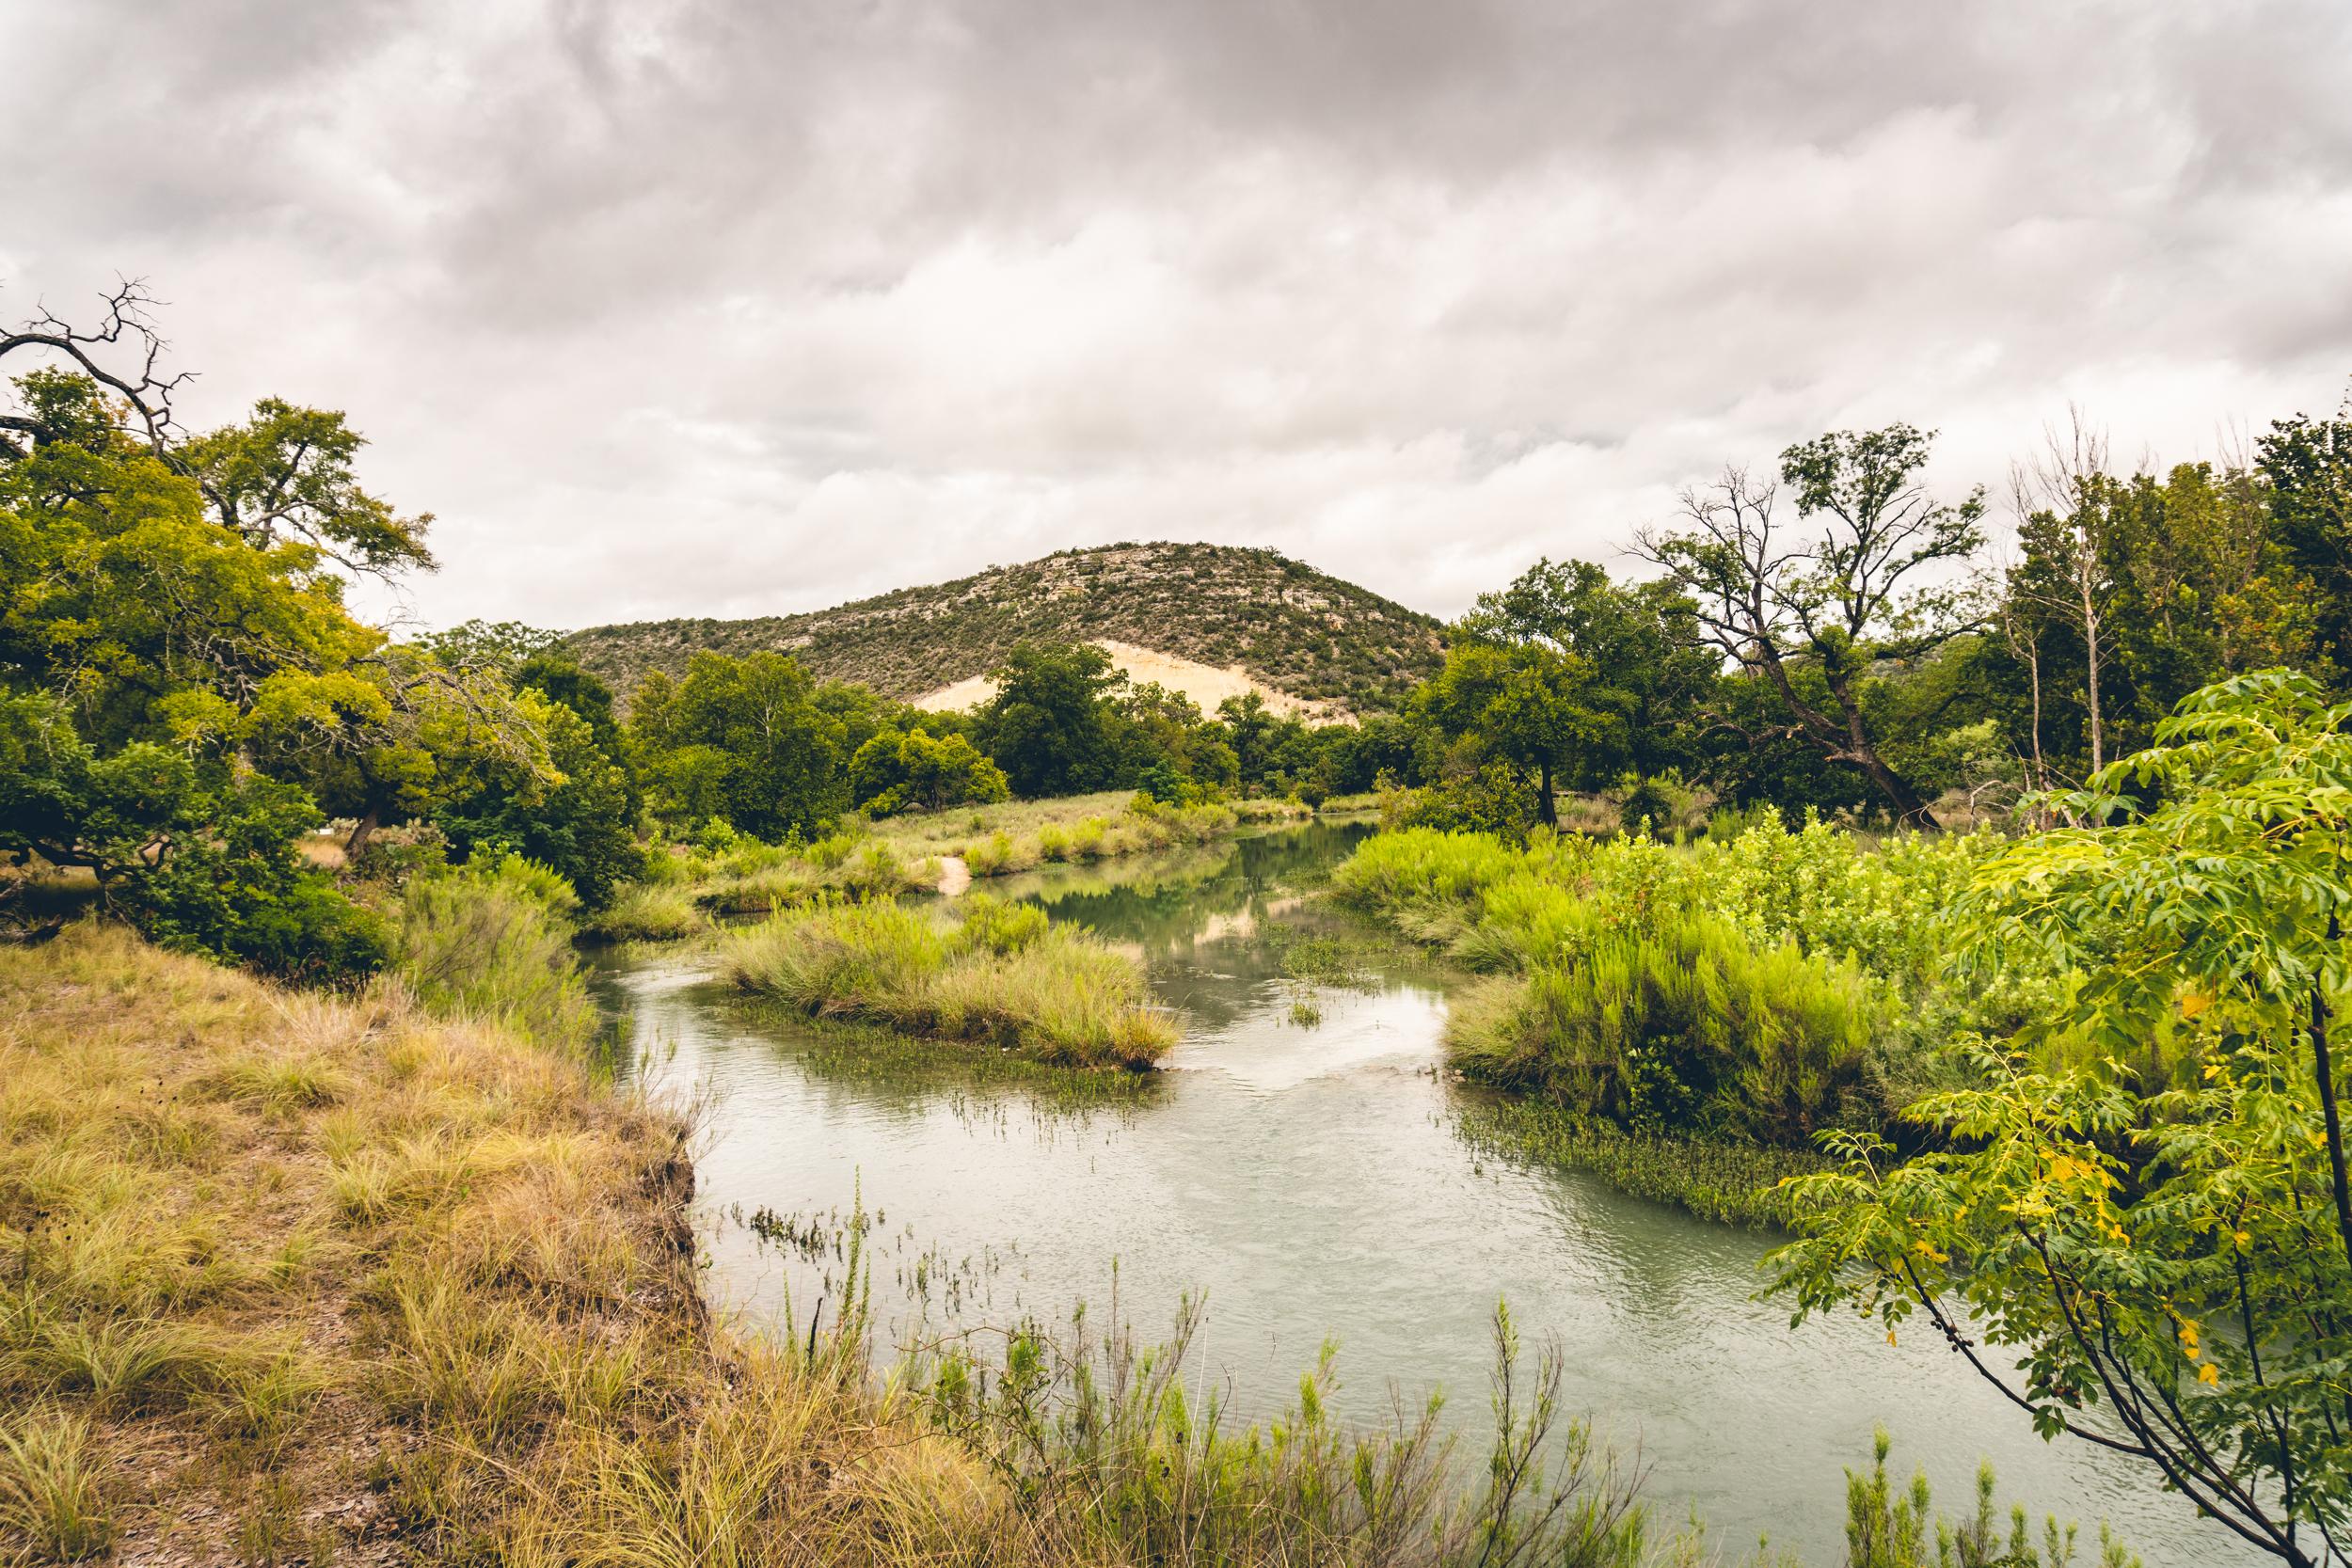 1808_Illano-River-State-Park-9.jpg